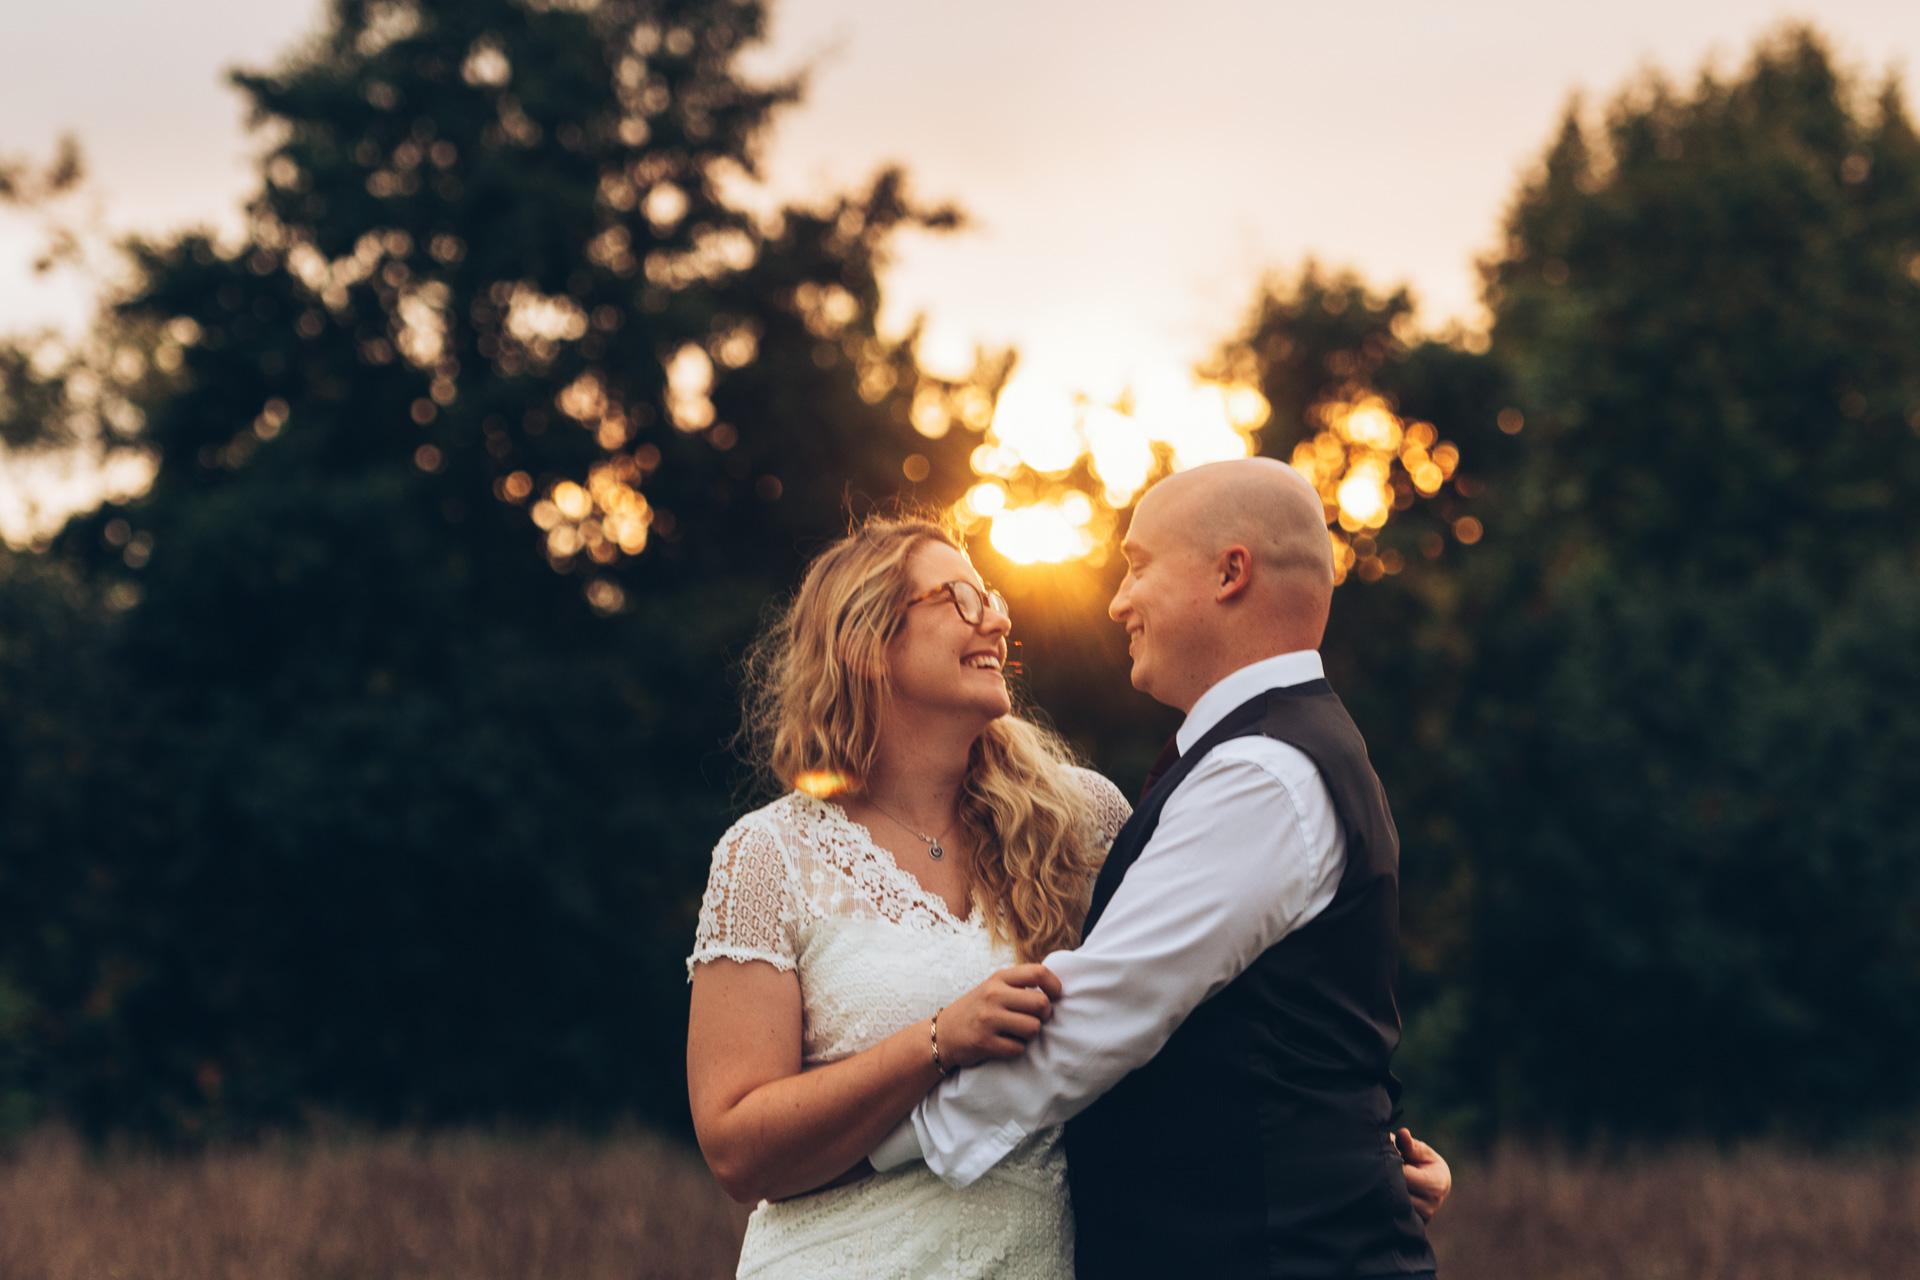 Small intimate weddings 193